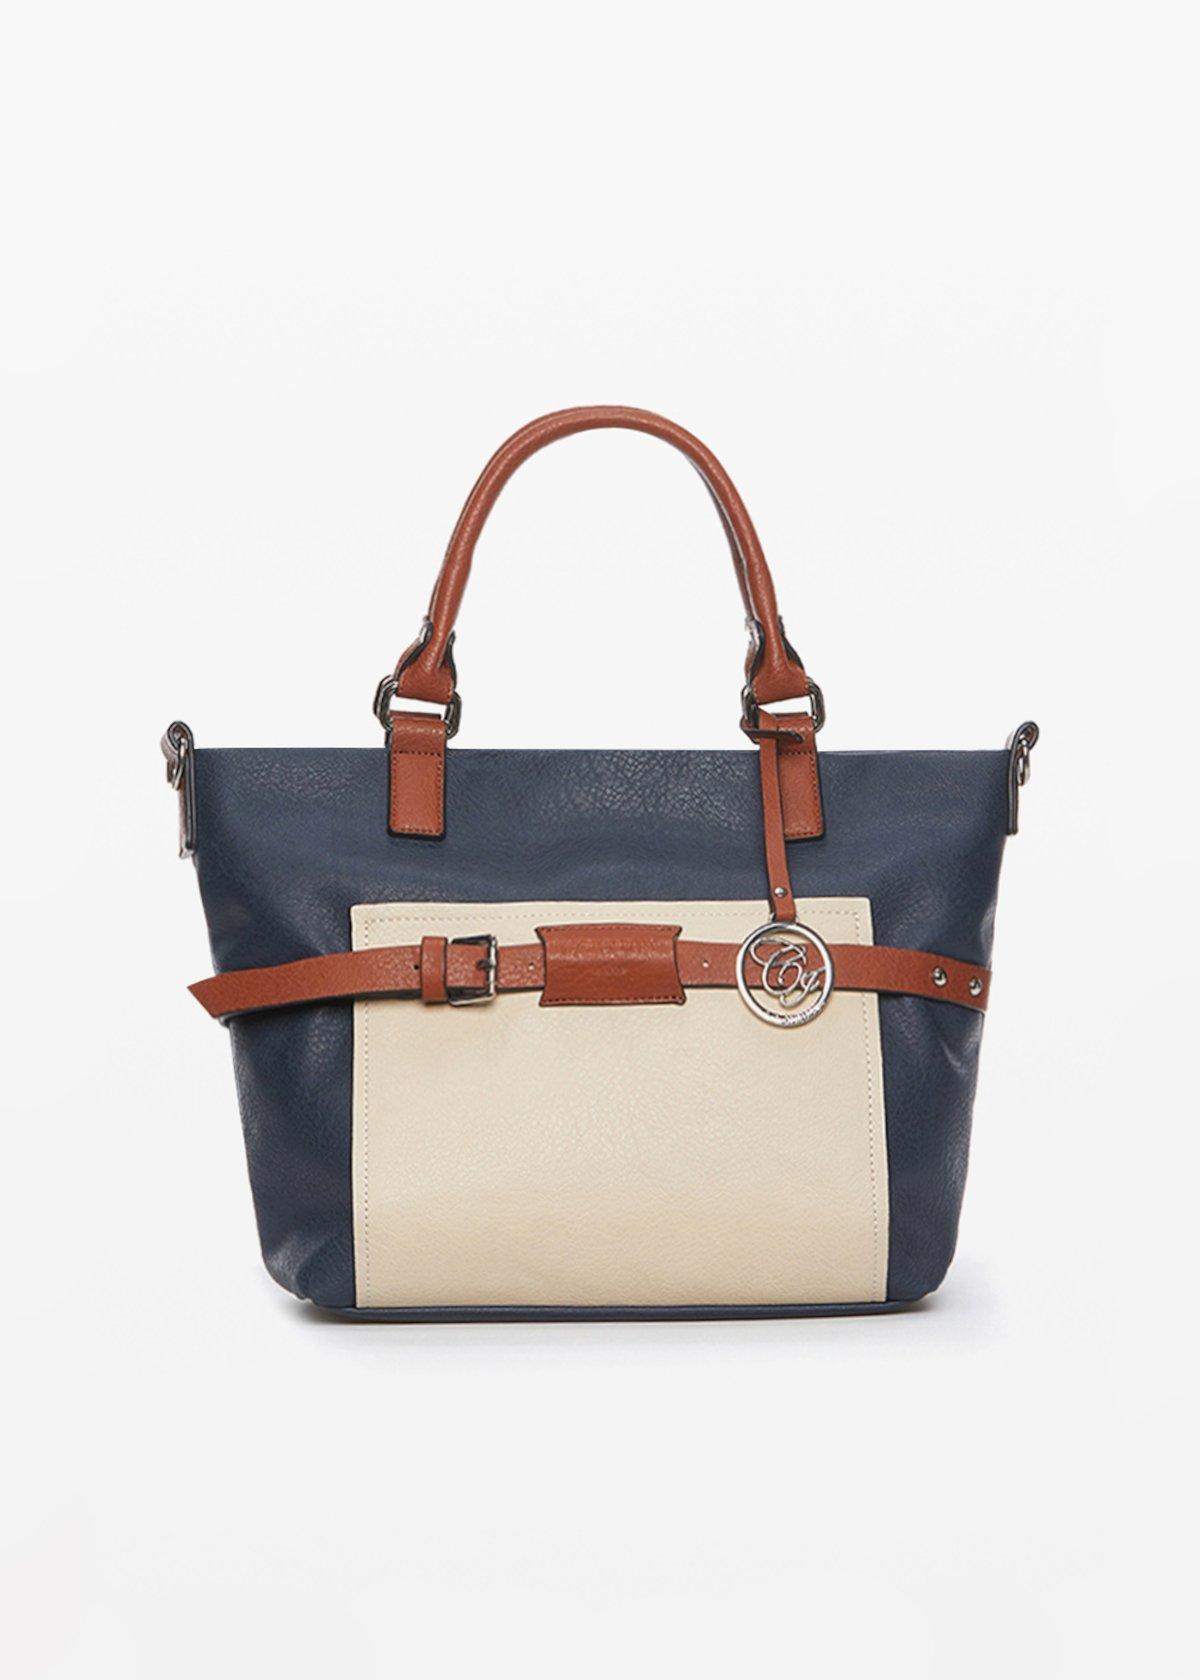 Brigida faux leather bag with shoulder strap - Light Beige /  Medium Blue - Woman - Category image